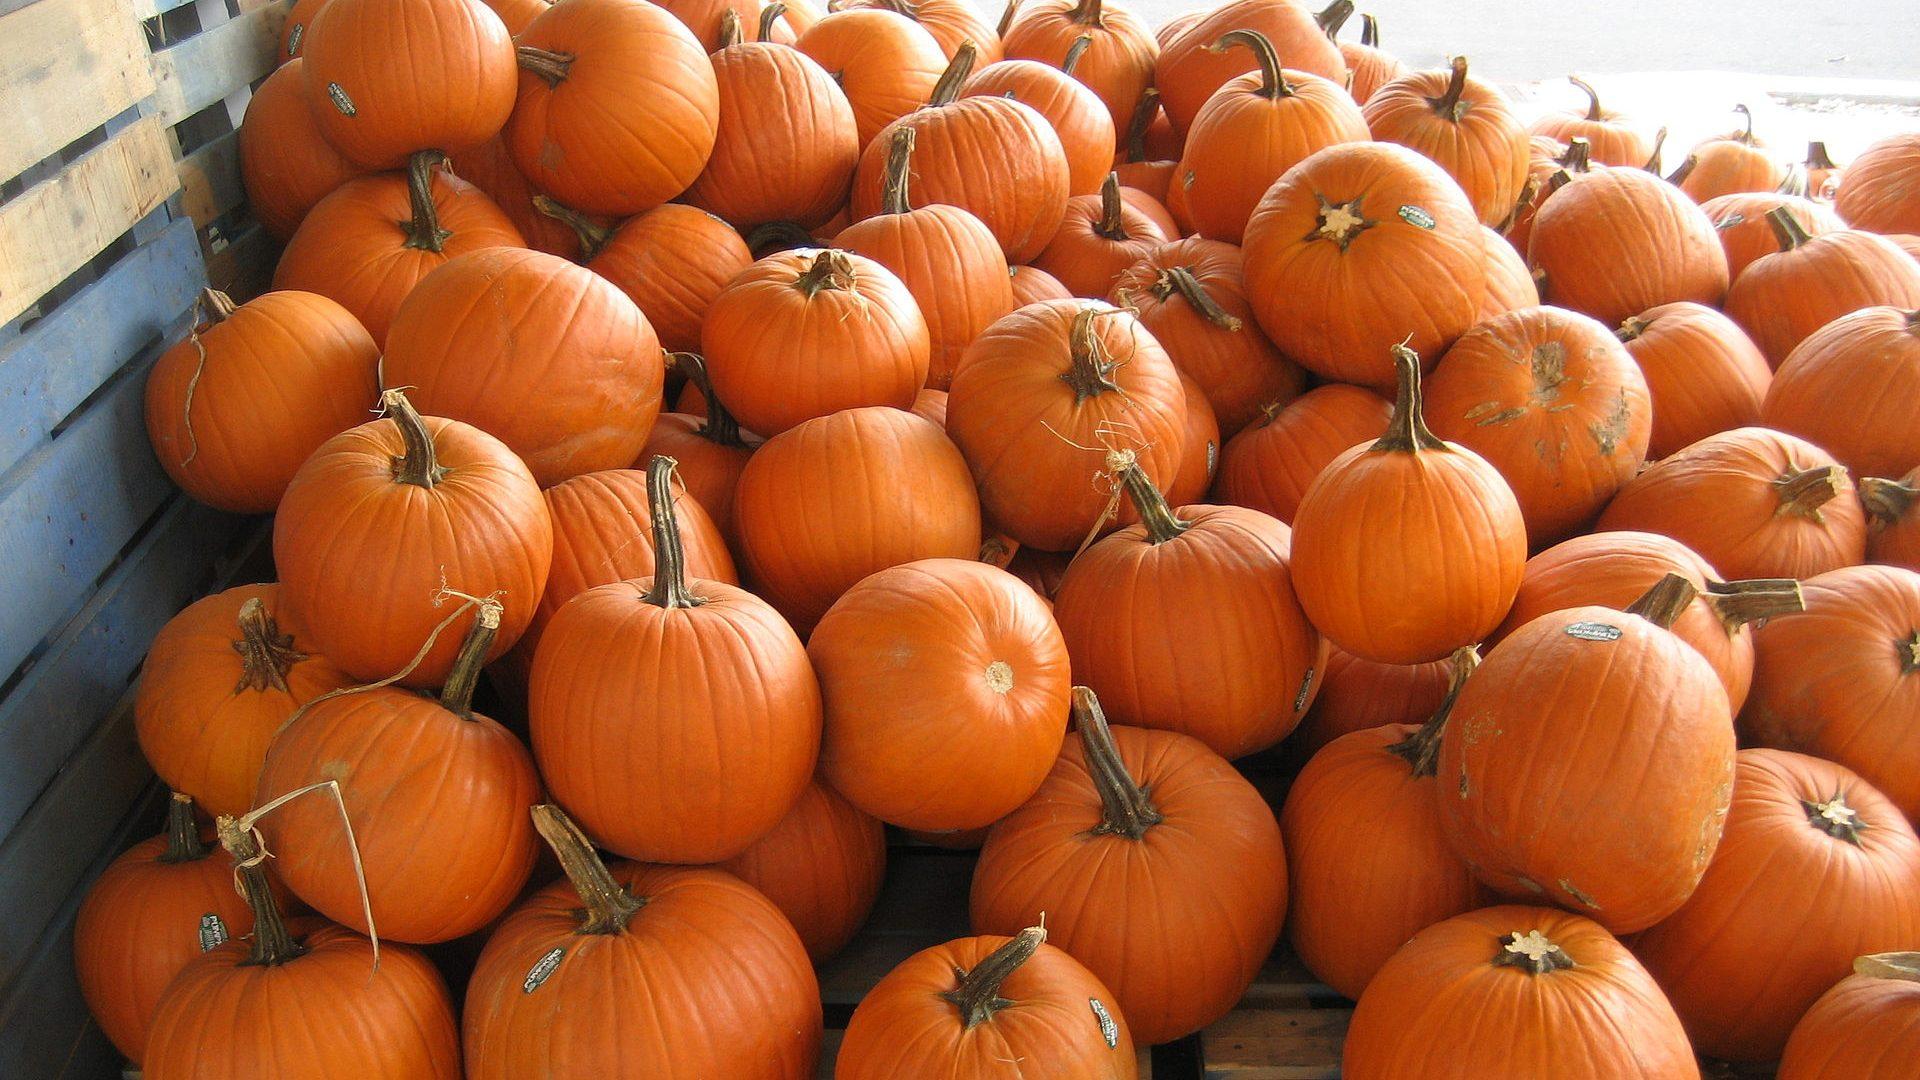 Decorative Picture of Pumpkins